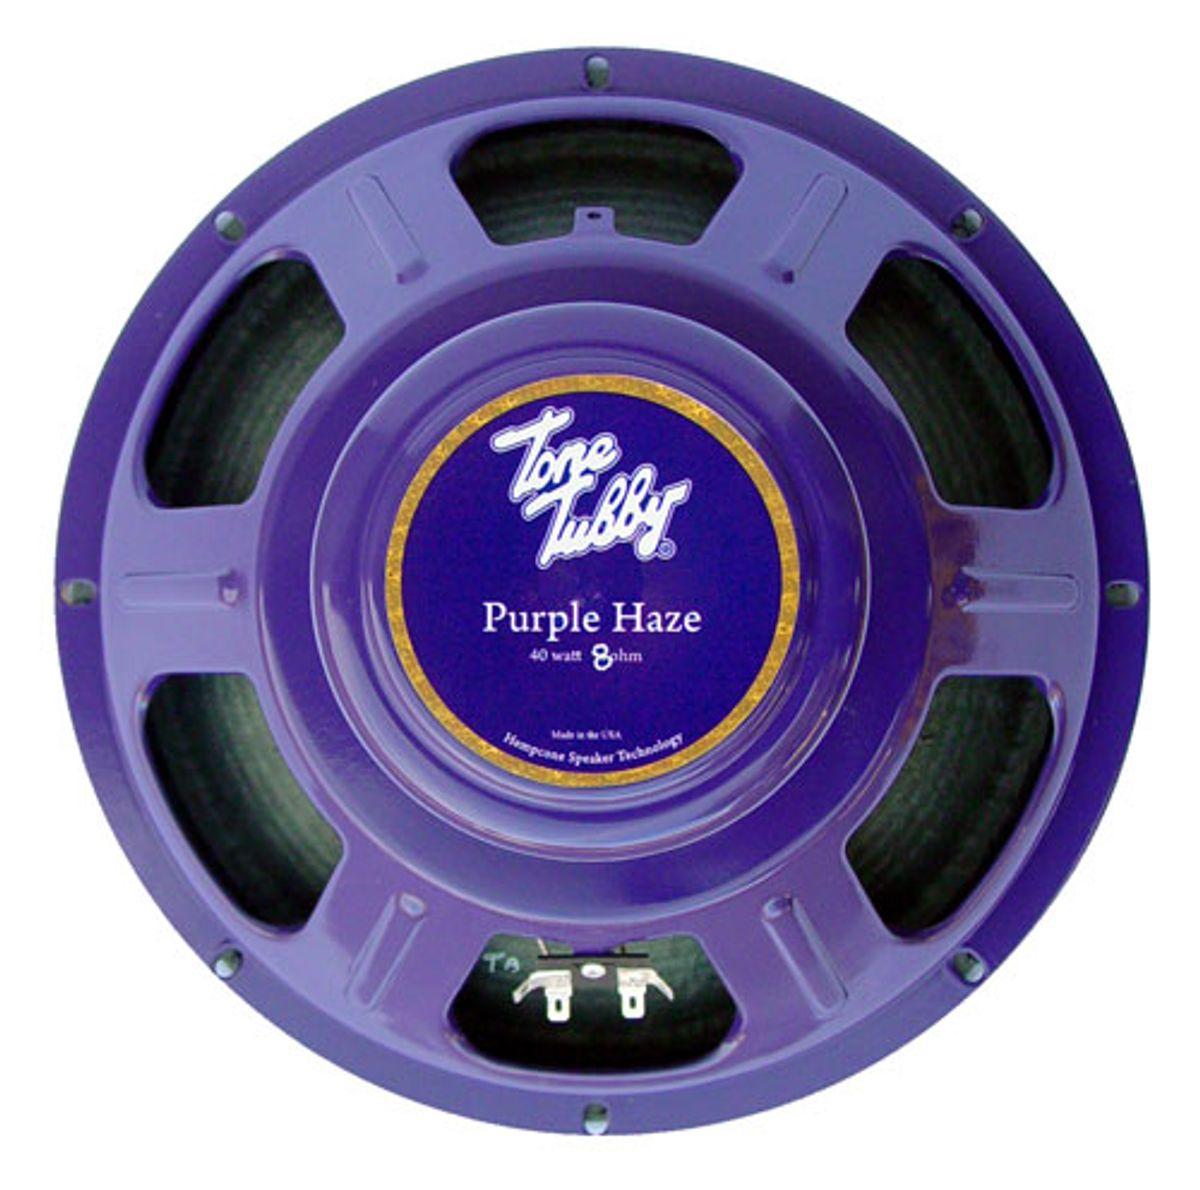 Tone Tubby Speakers Announces the Purple Haze